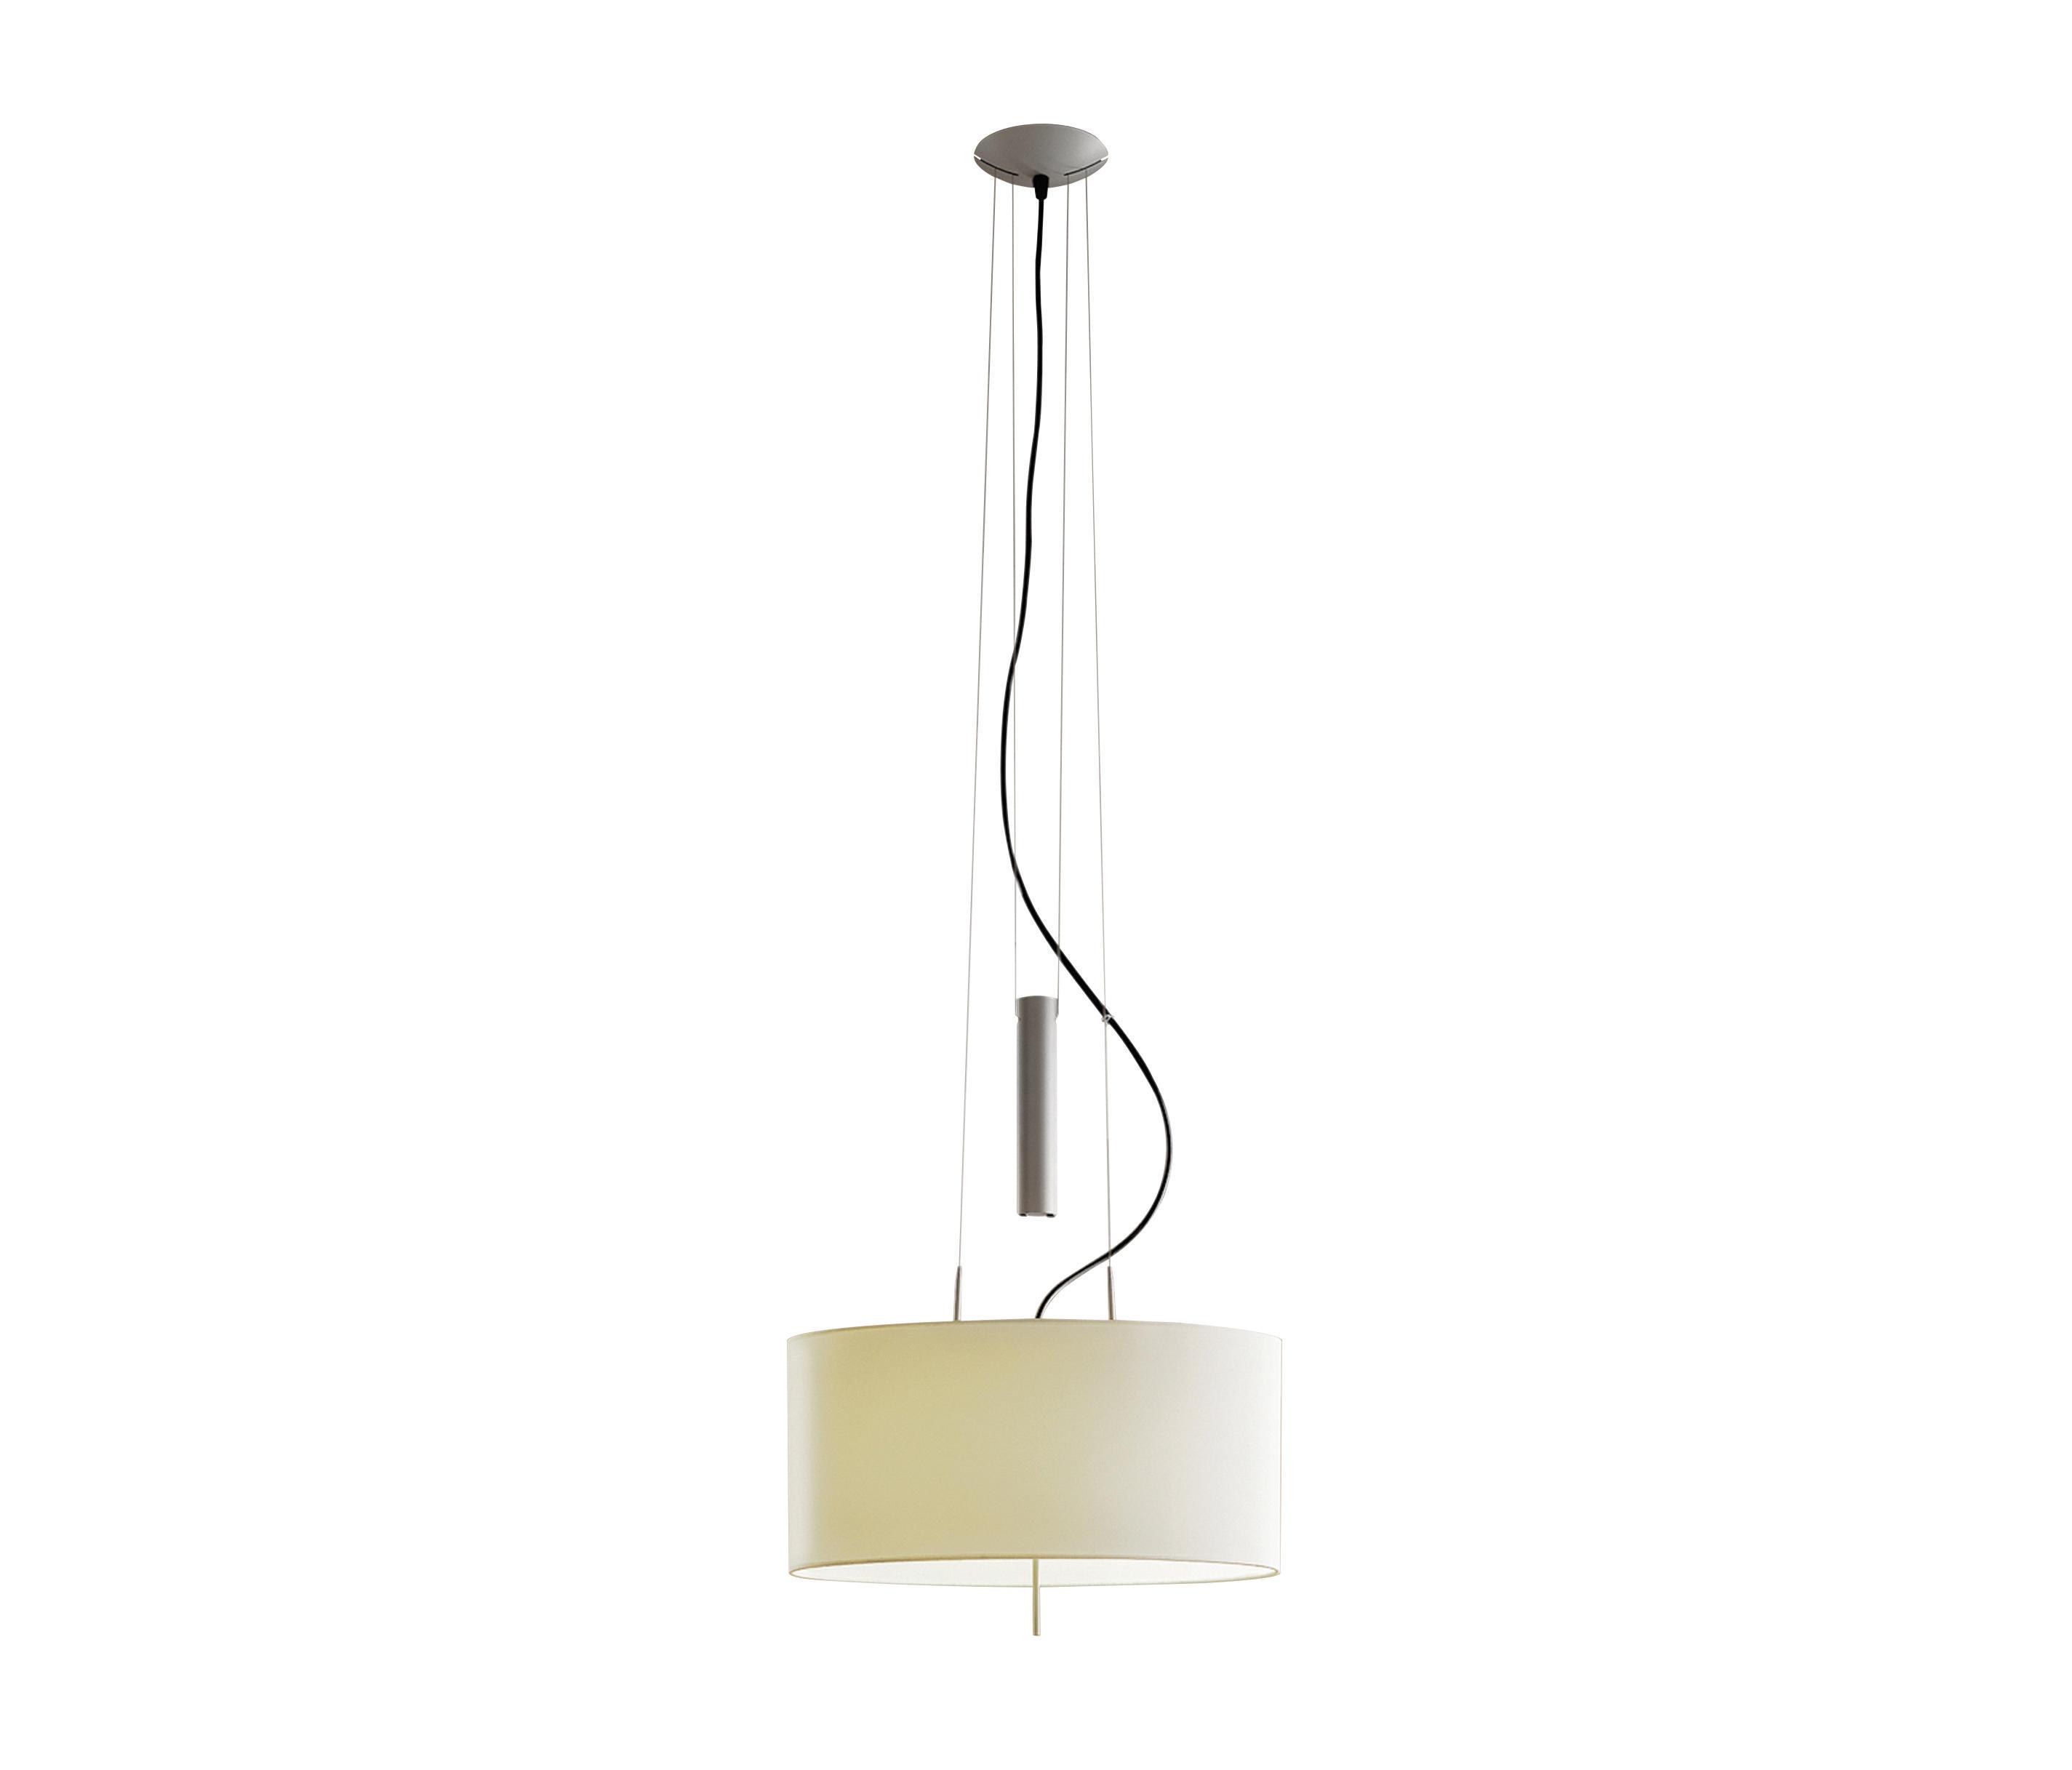 Funi Pendant Lamp 60cm E27 2x100W metallic lead lampshade Beige